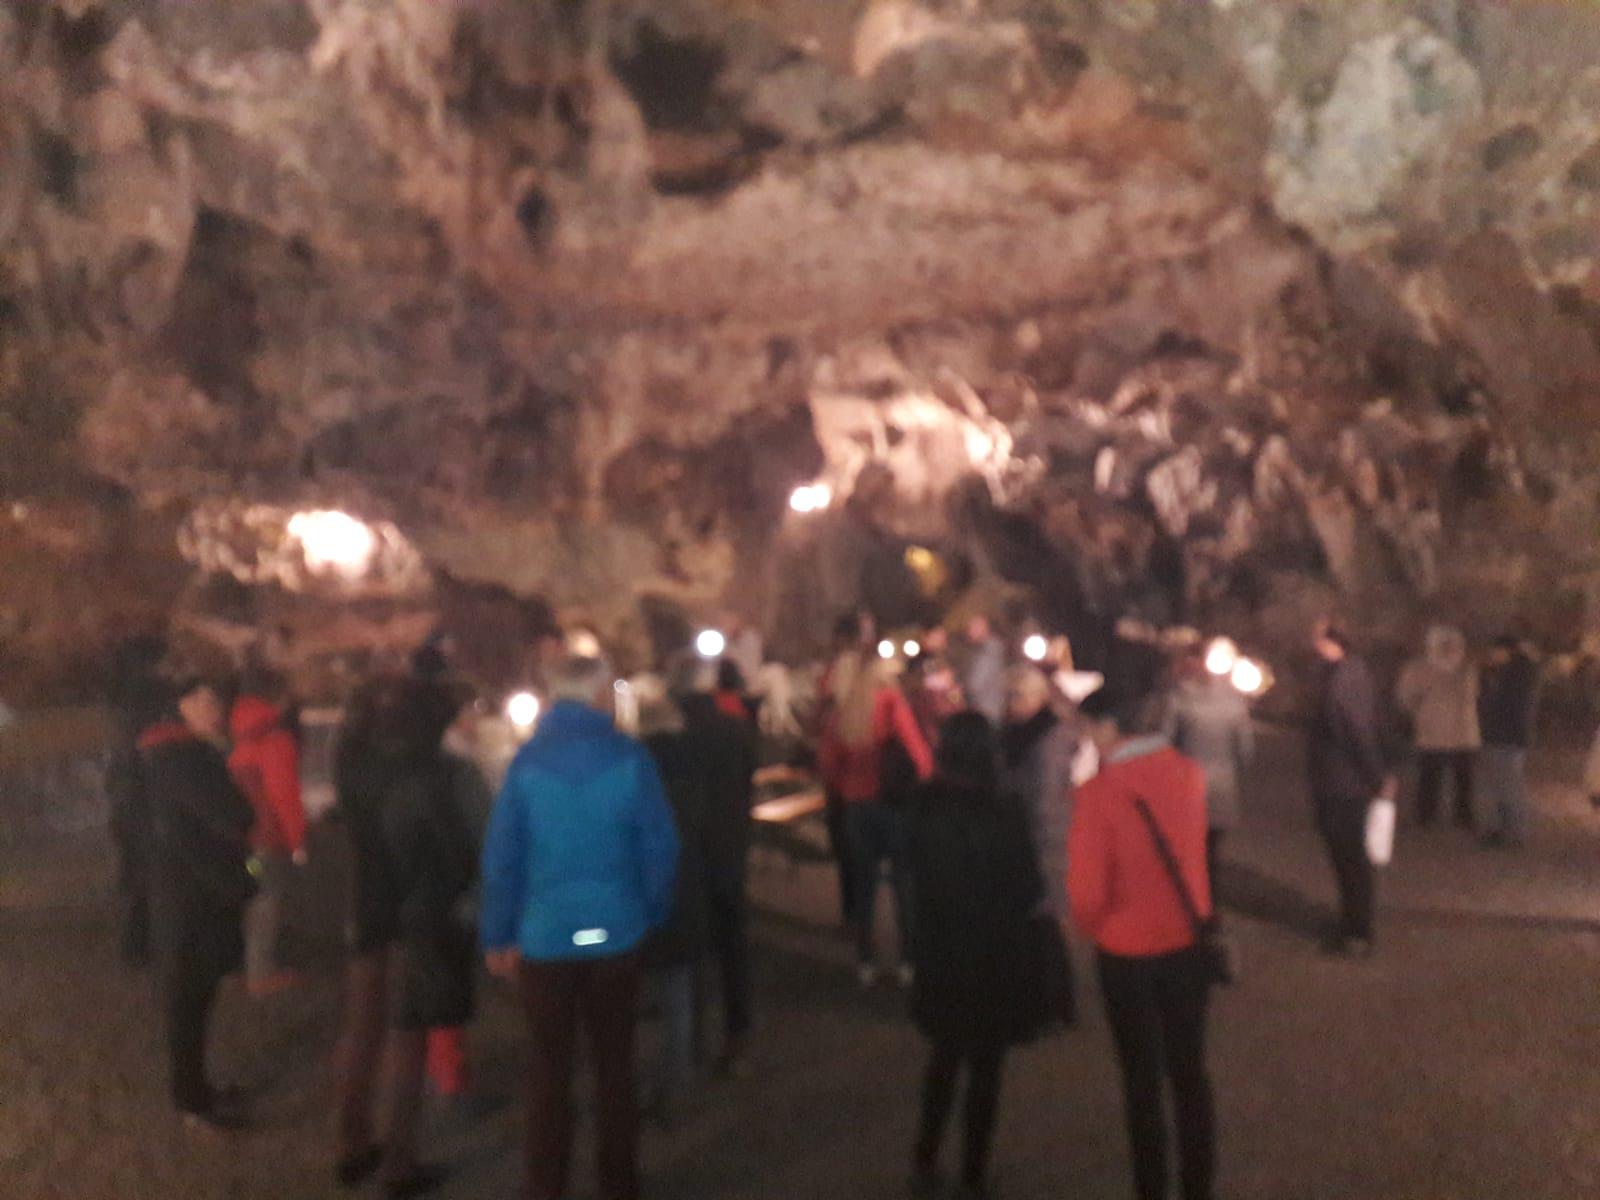 La visita alle grotte di Ostrov u Macochy